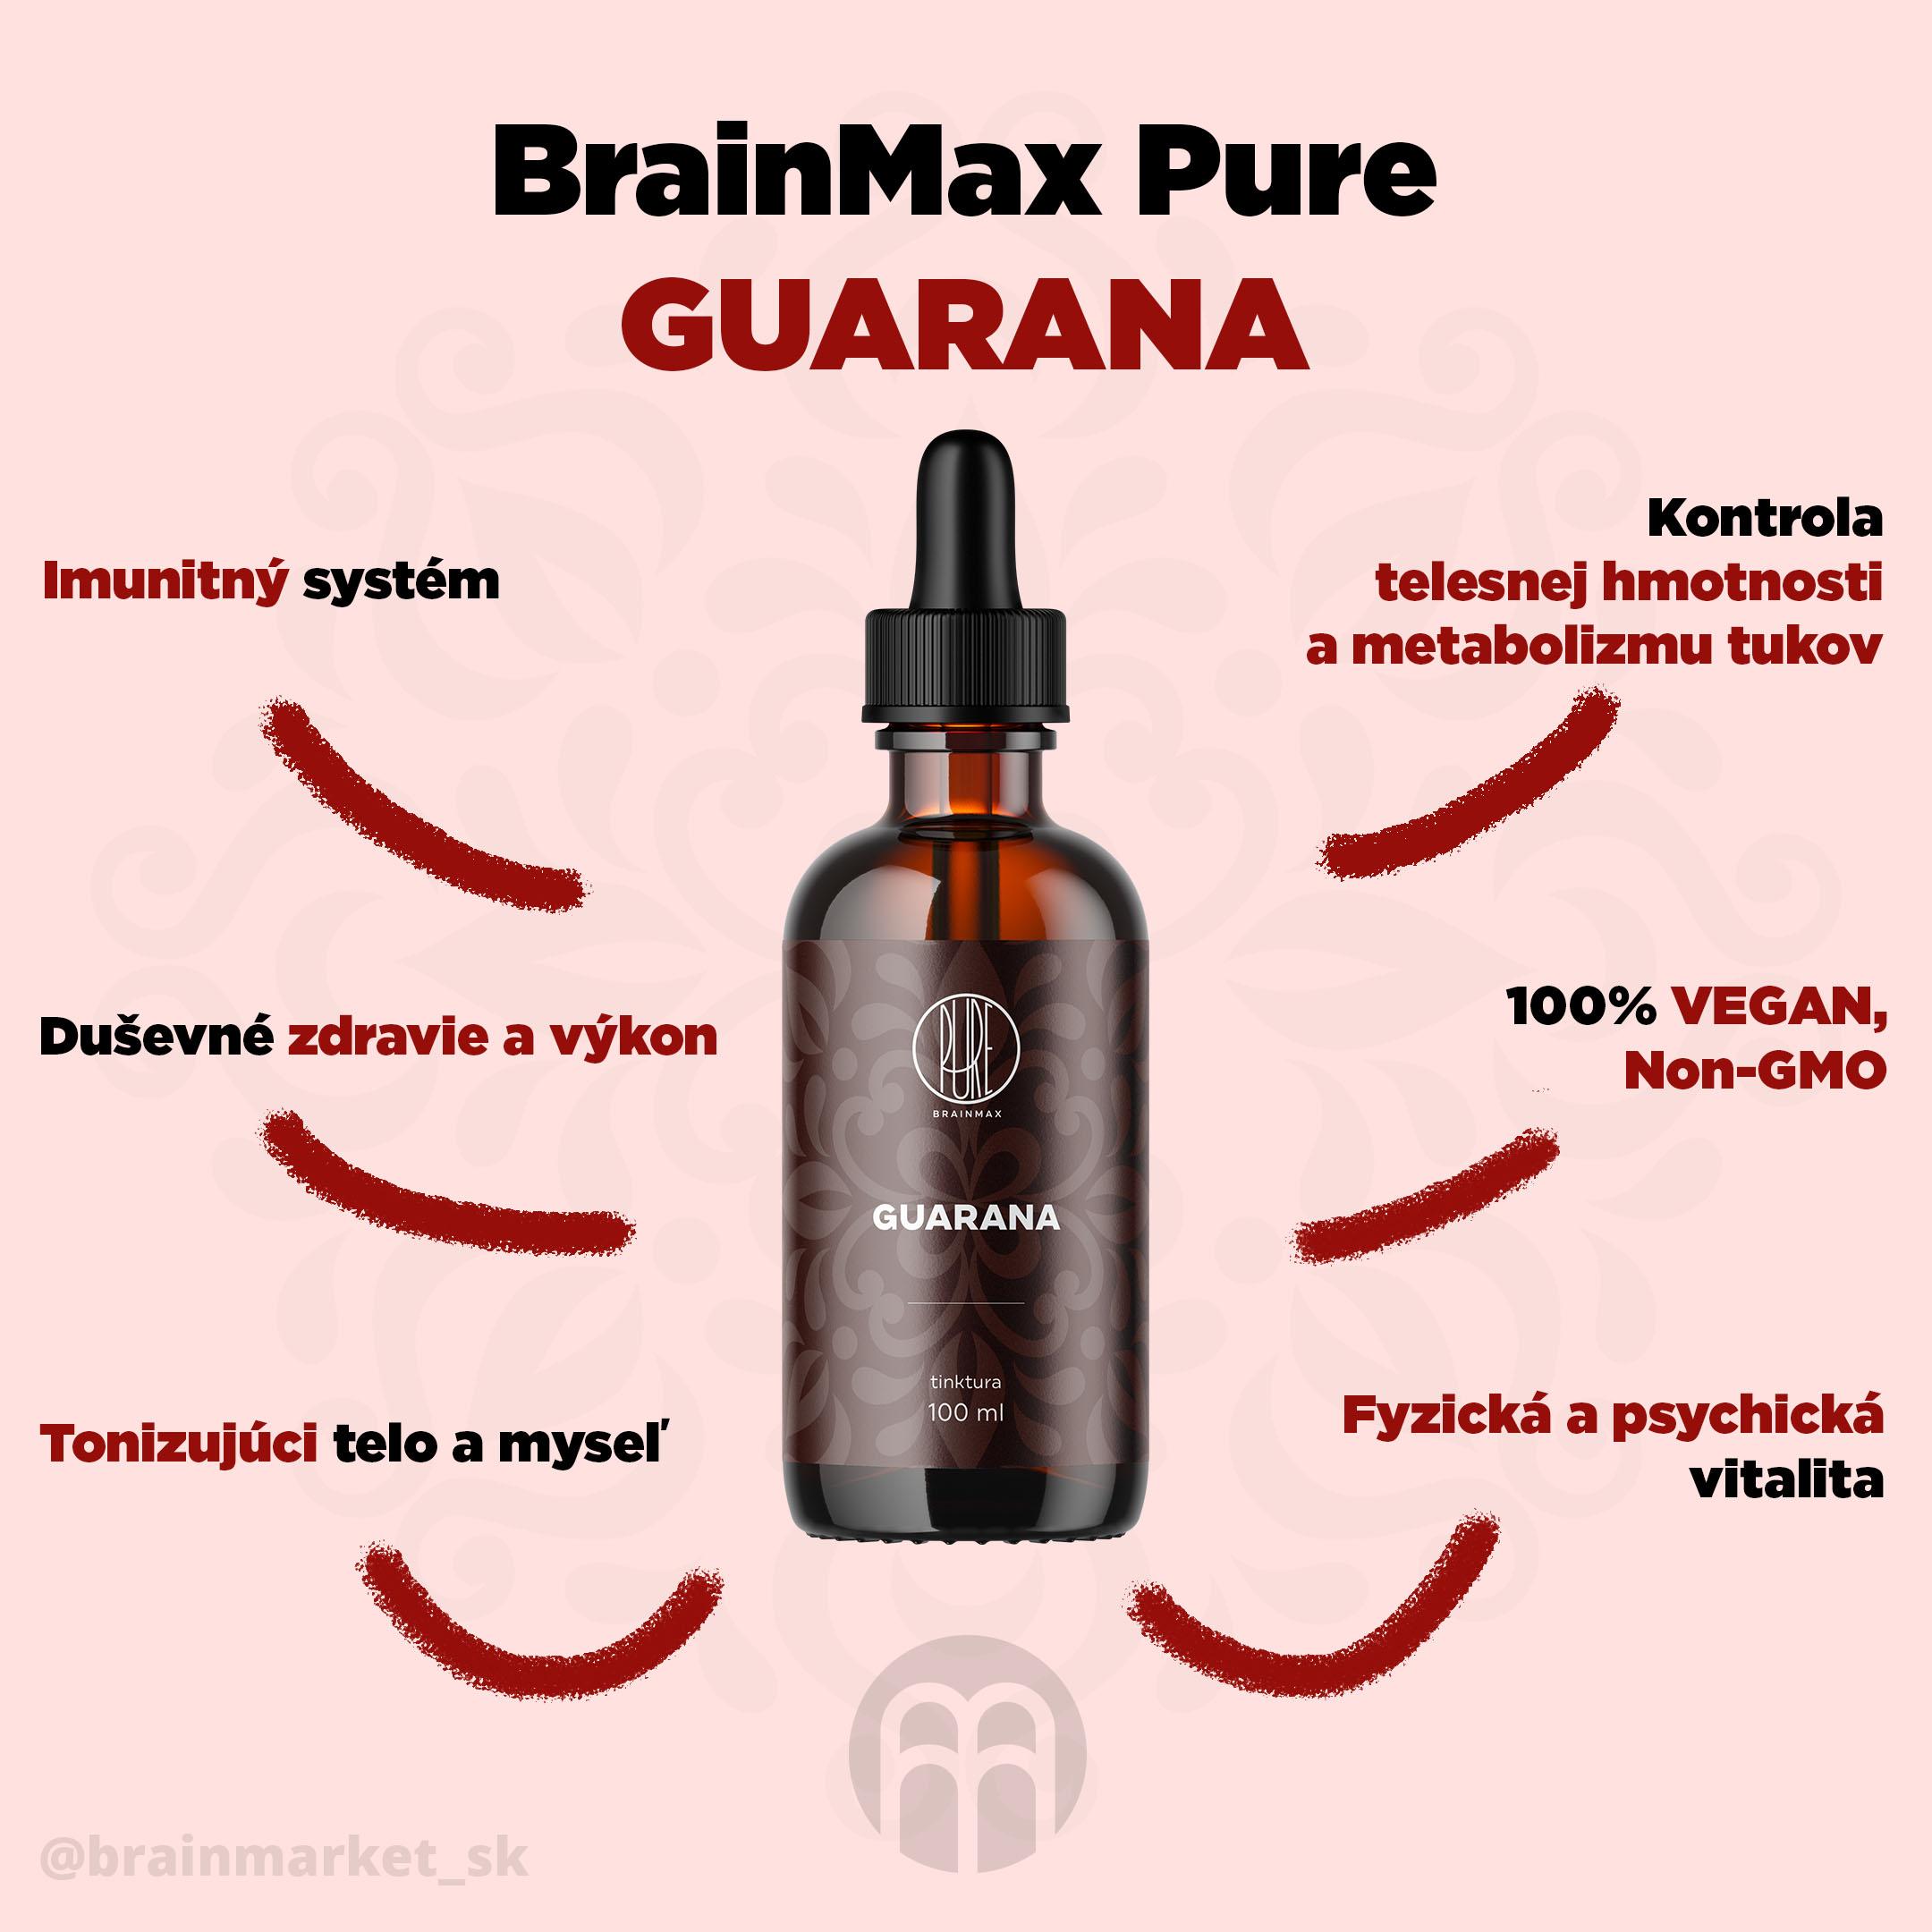 guarana_infografika_brainmarket_sk